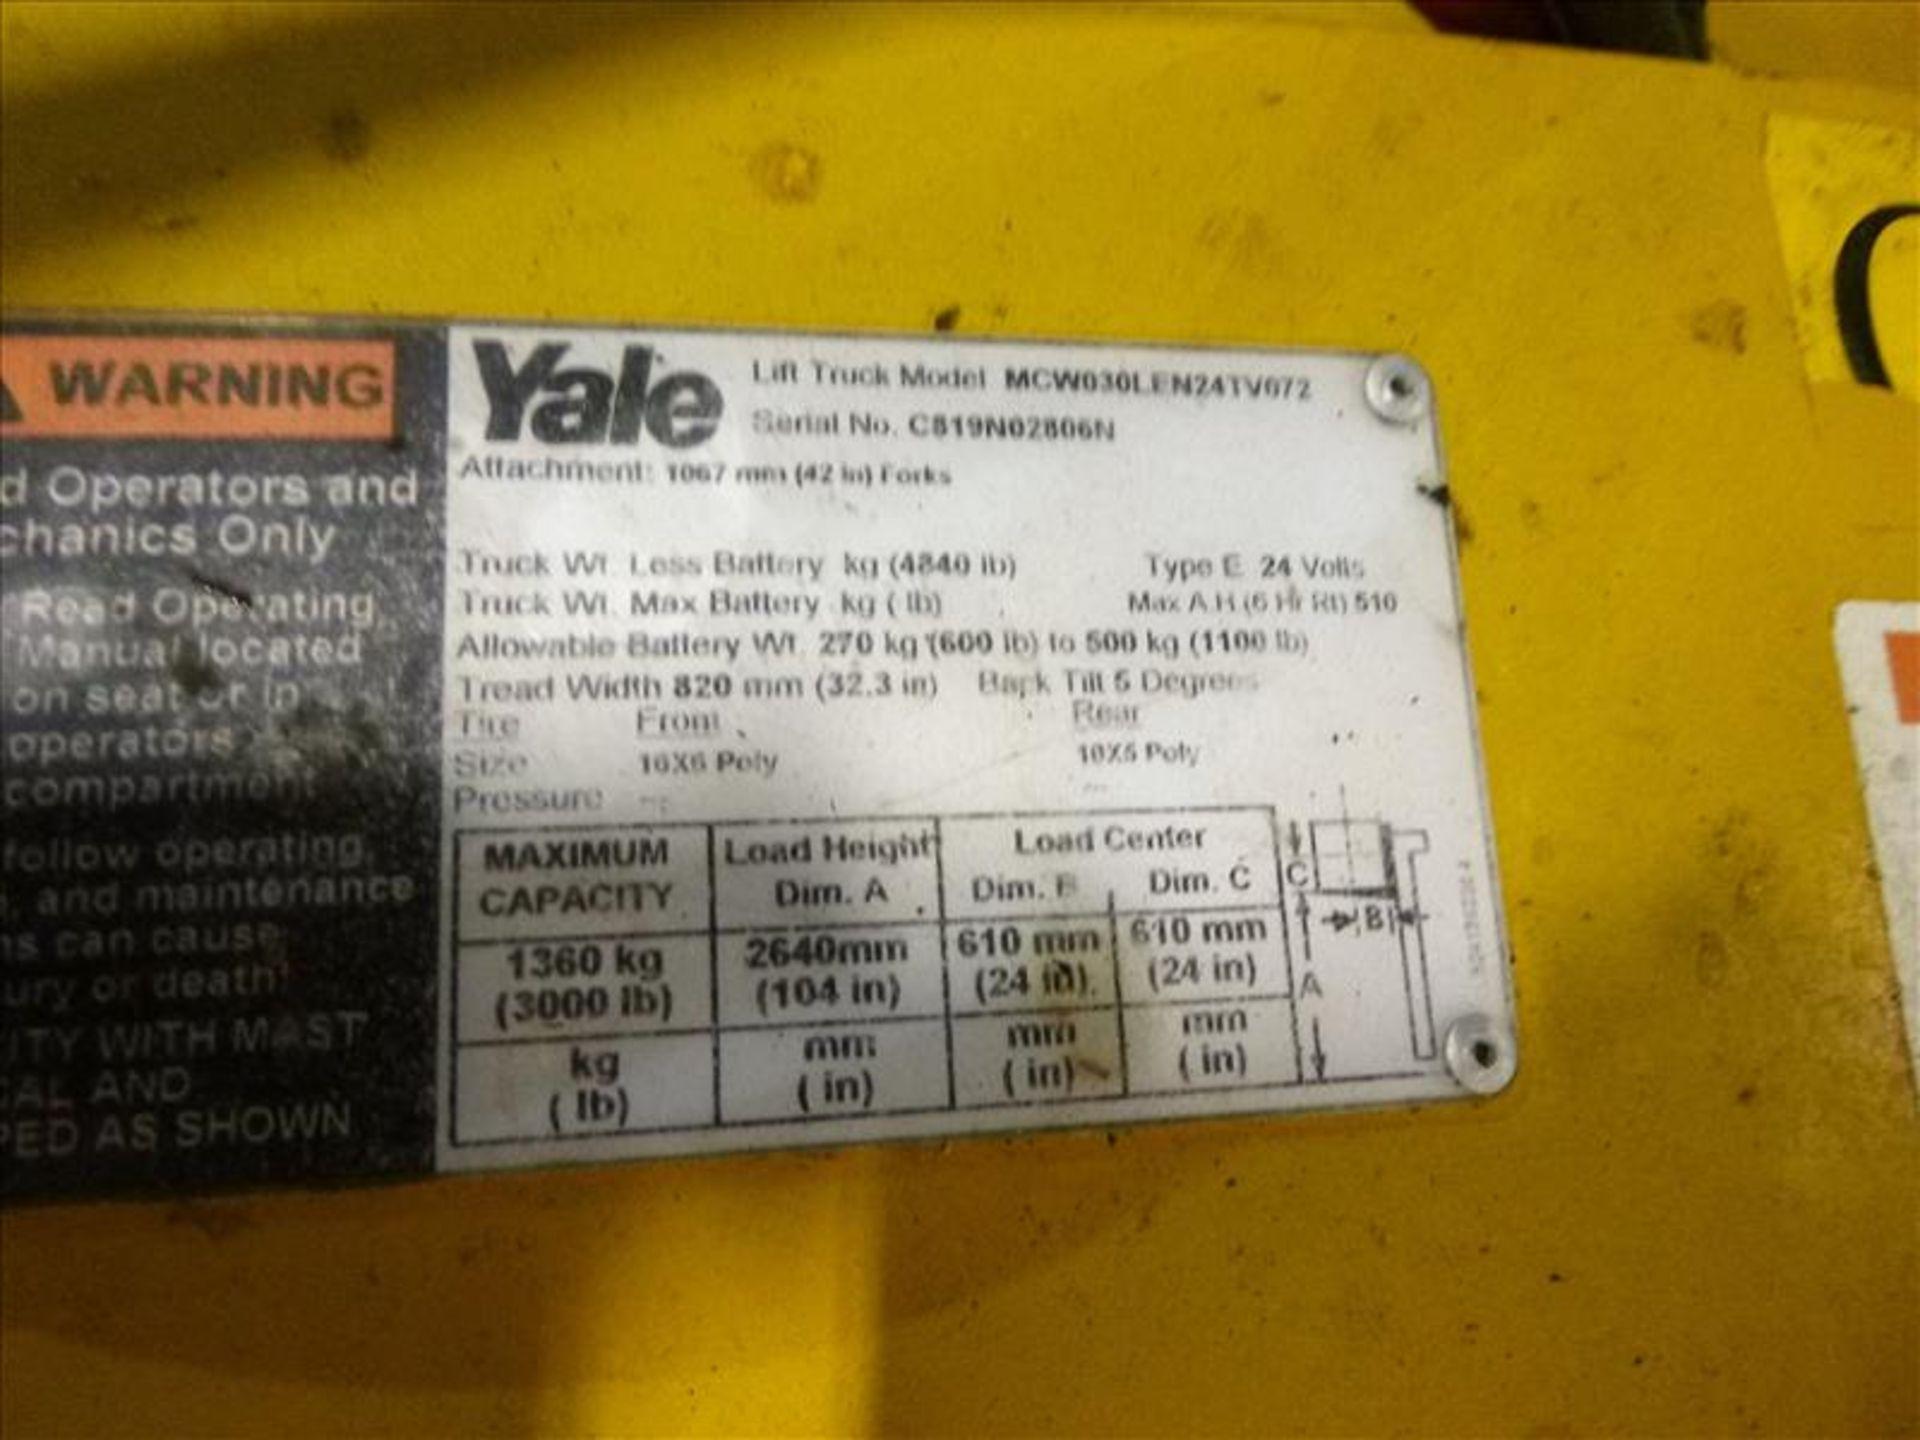 Yale walk-behind fork lift truck, mod. MCW030LEN24TV072, ser. no. C819N02806N, 24V electric, 3000 - Image 3 of 3